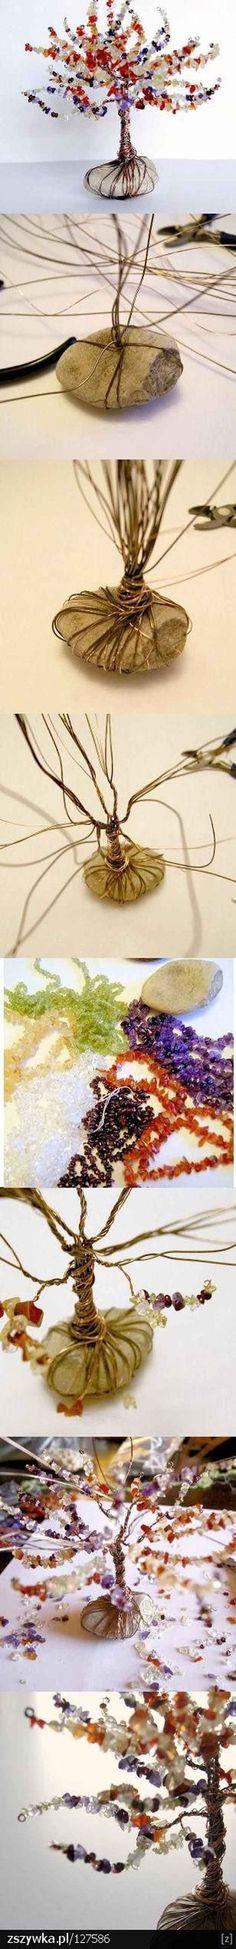 Fun DIY Tree of LIfe Decoration and Ideas | DIY Wire Tree by DIY Ready at http://diyready.com/12-diy-tree-of-life-ideas/: